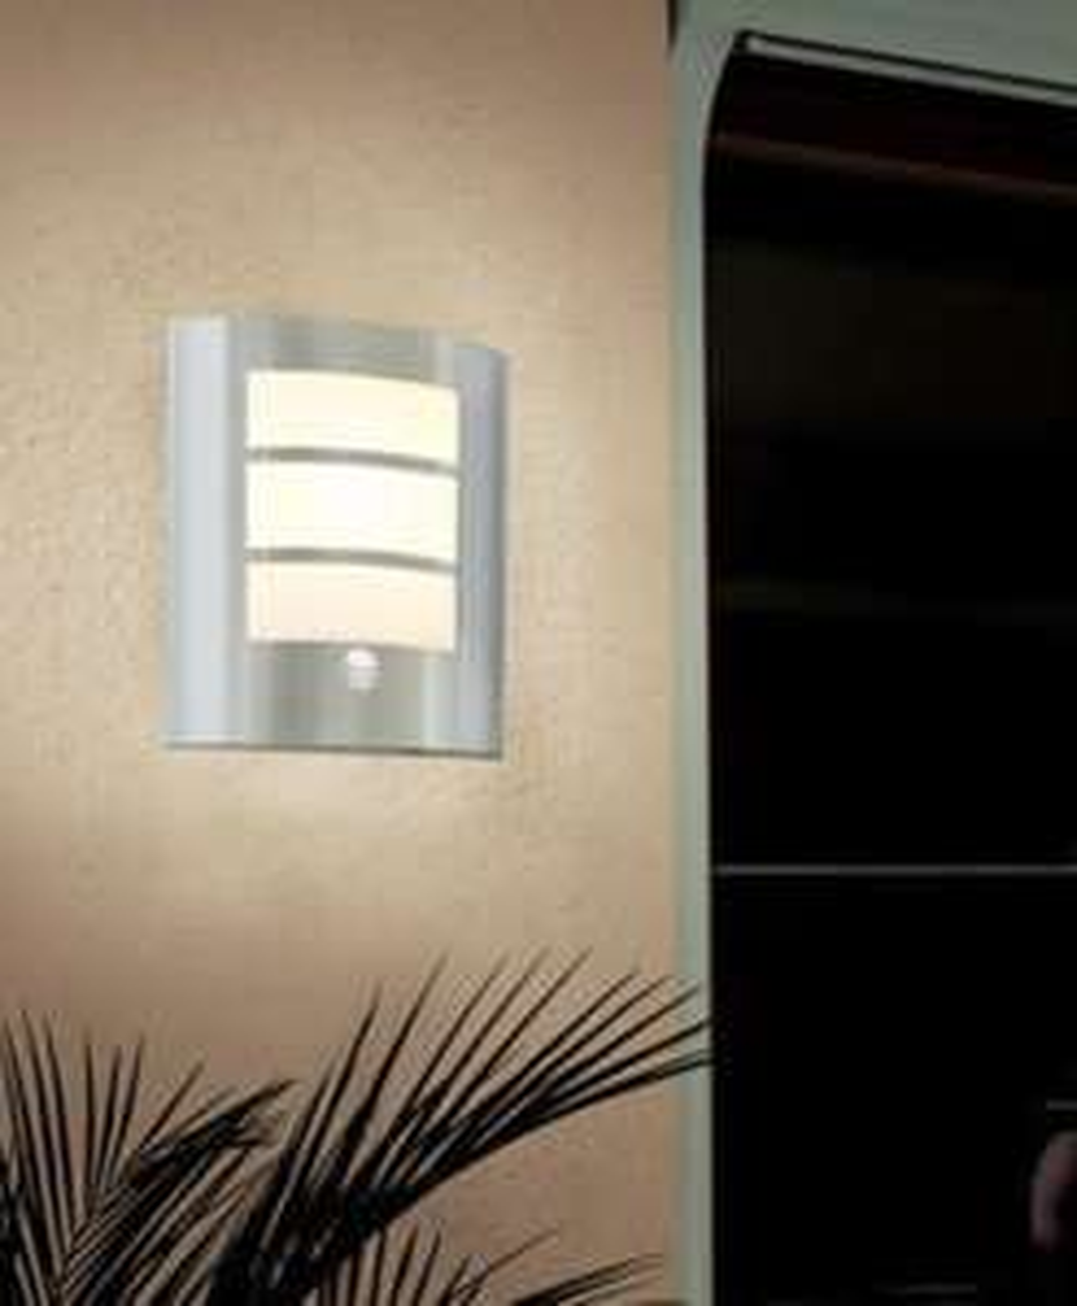 [Prijsfout] EGLO RVS wandlamp met sensor